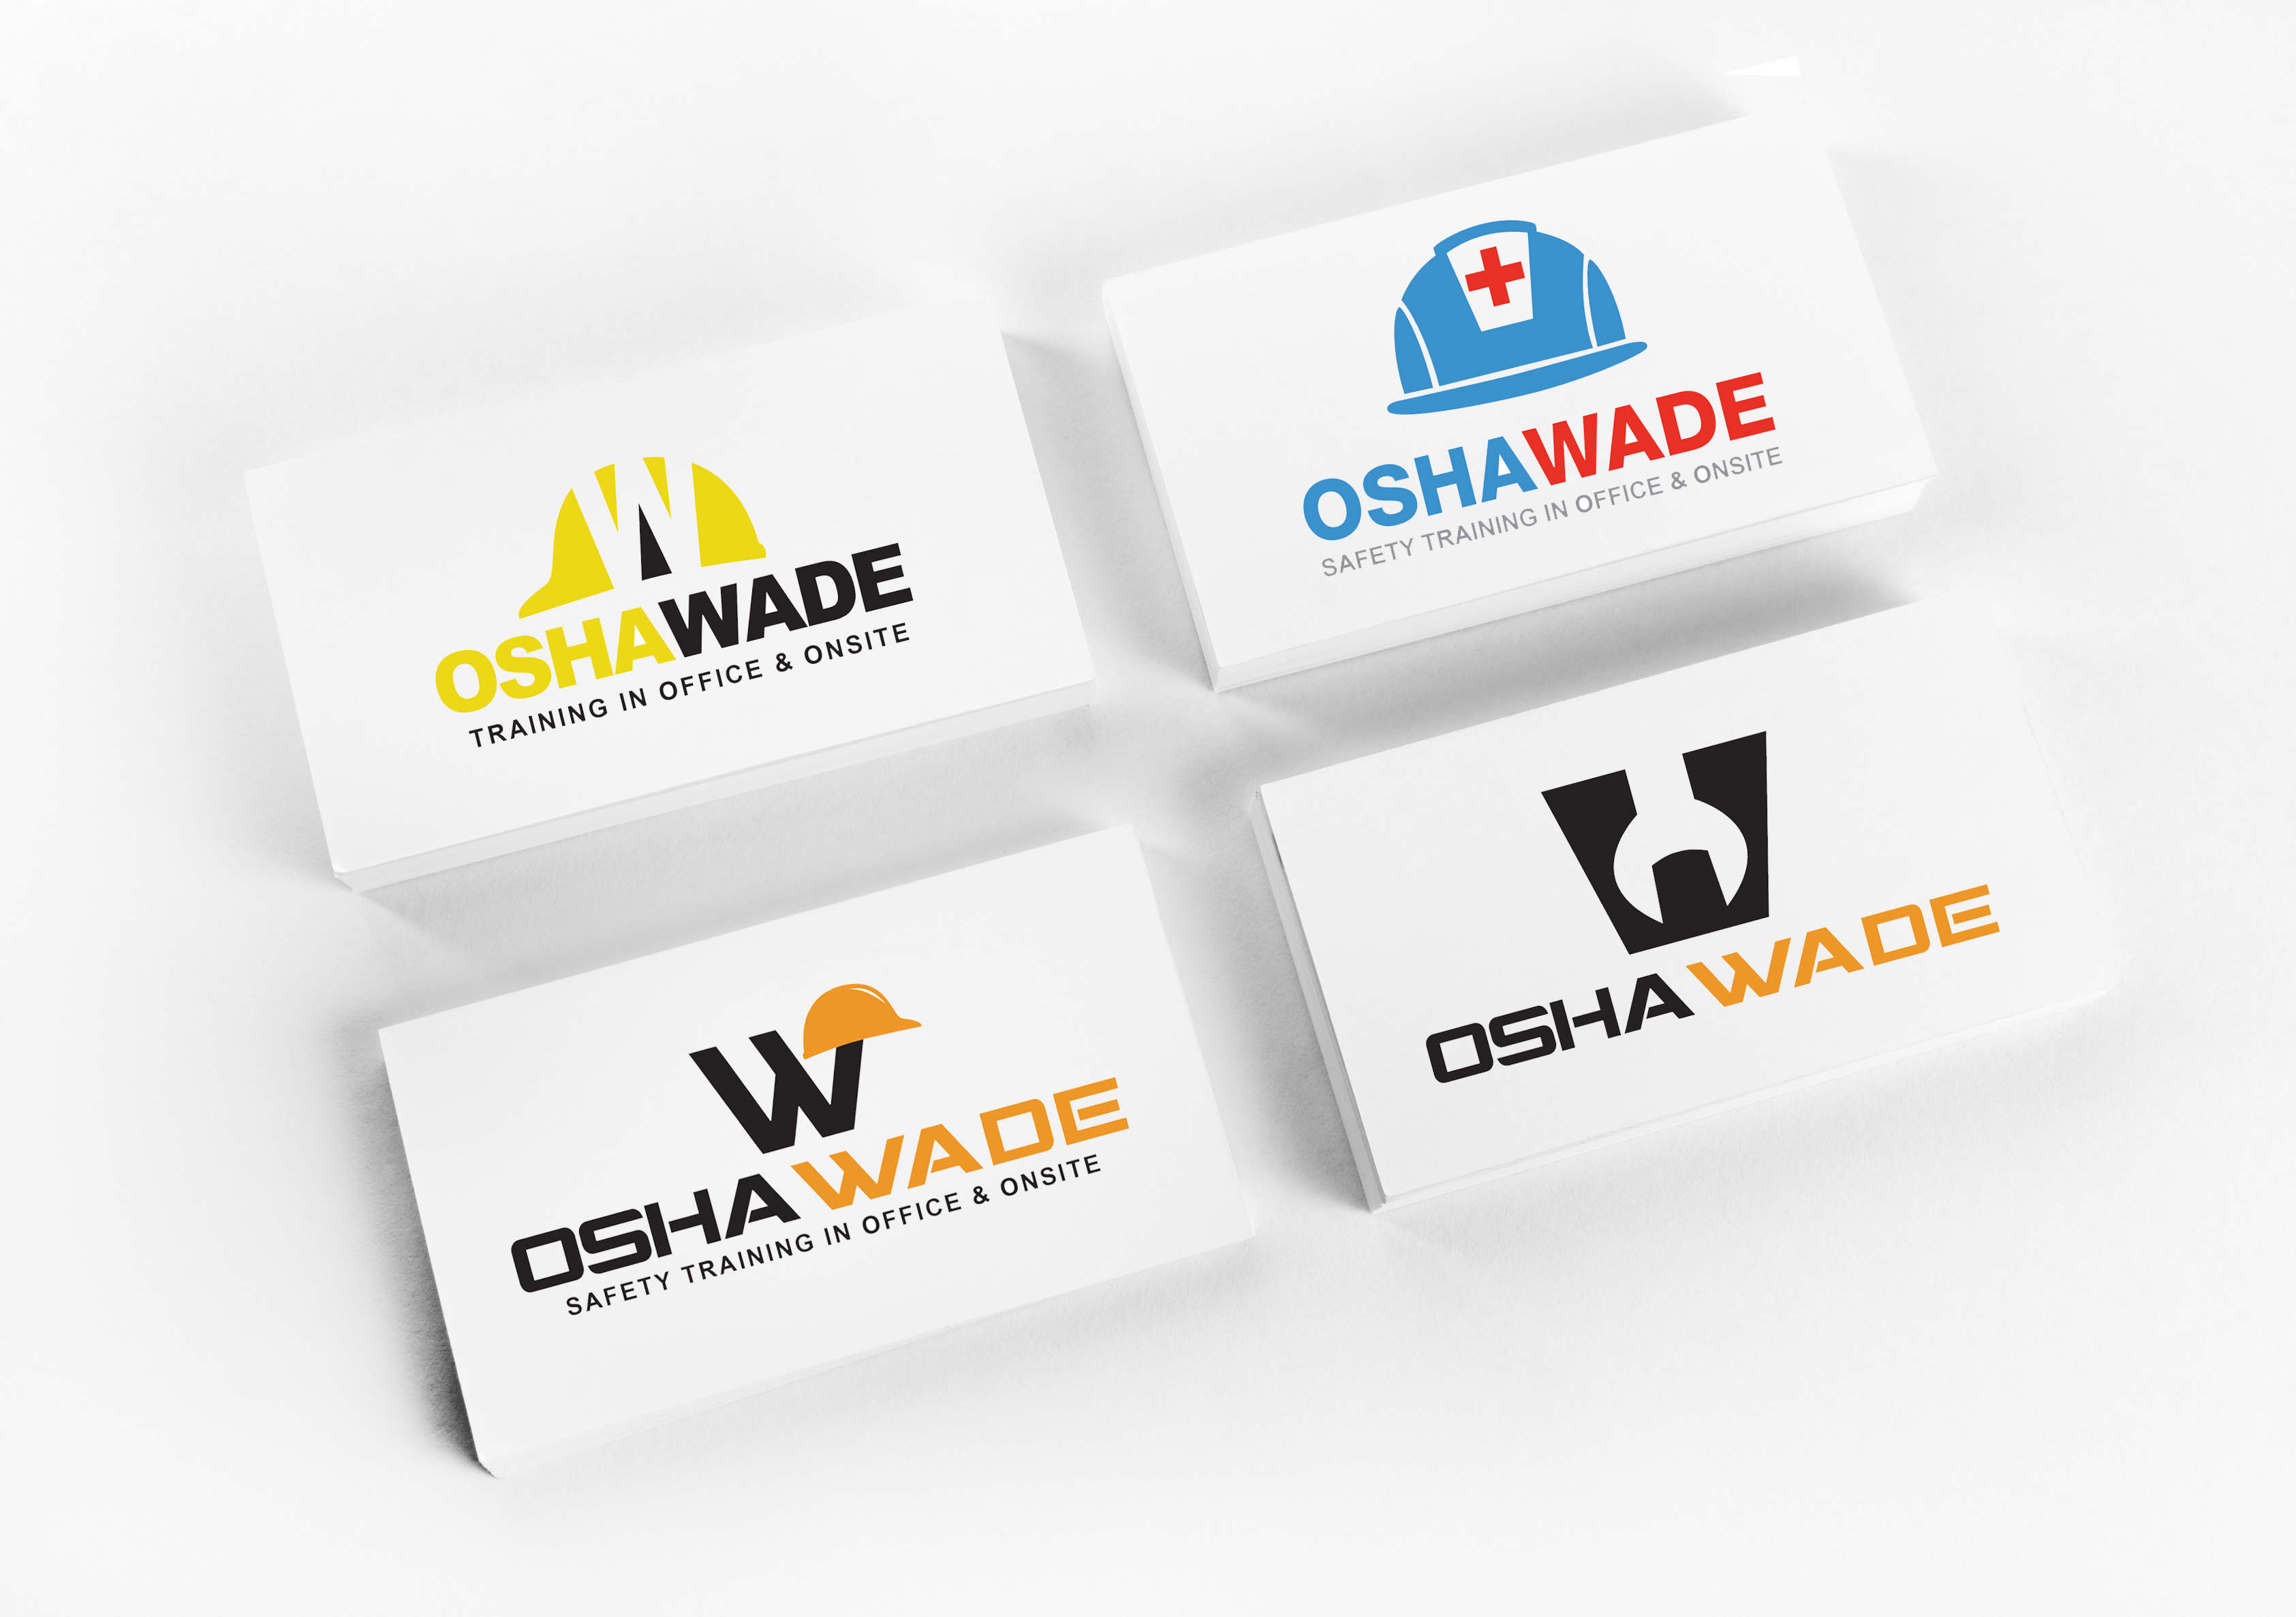 Wade logos